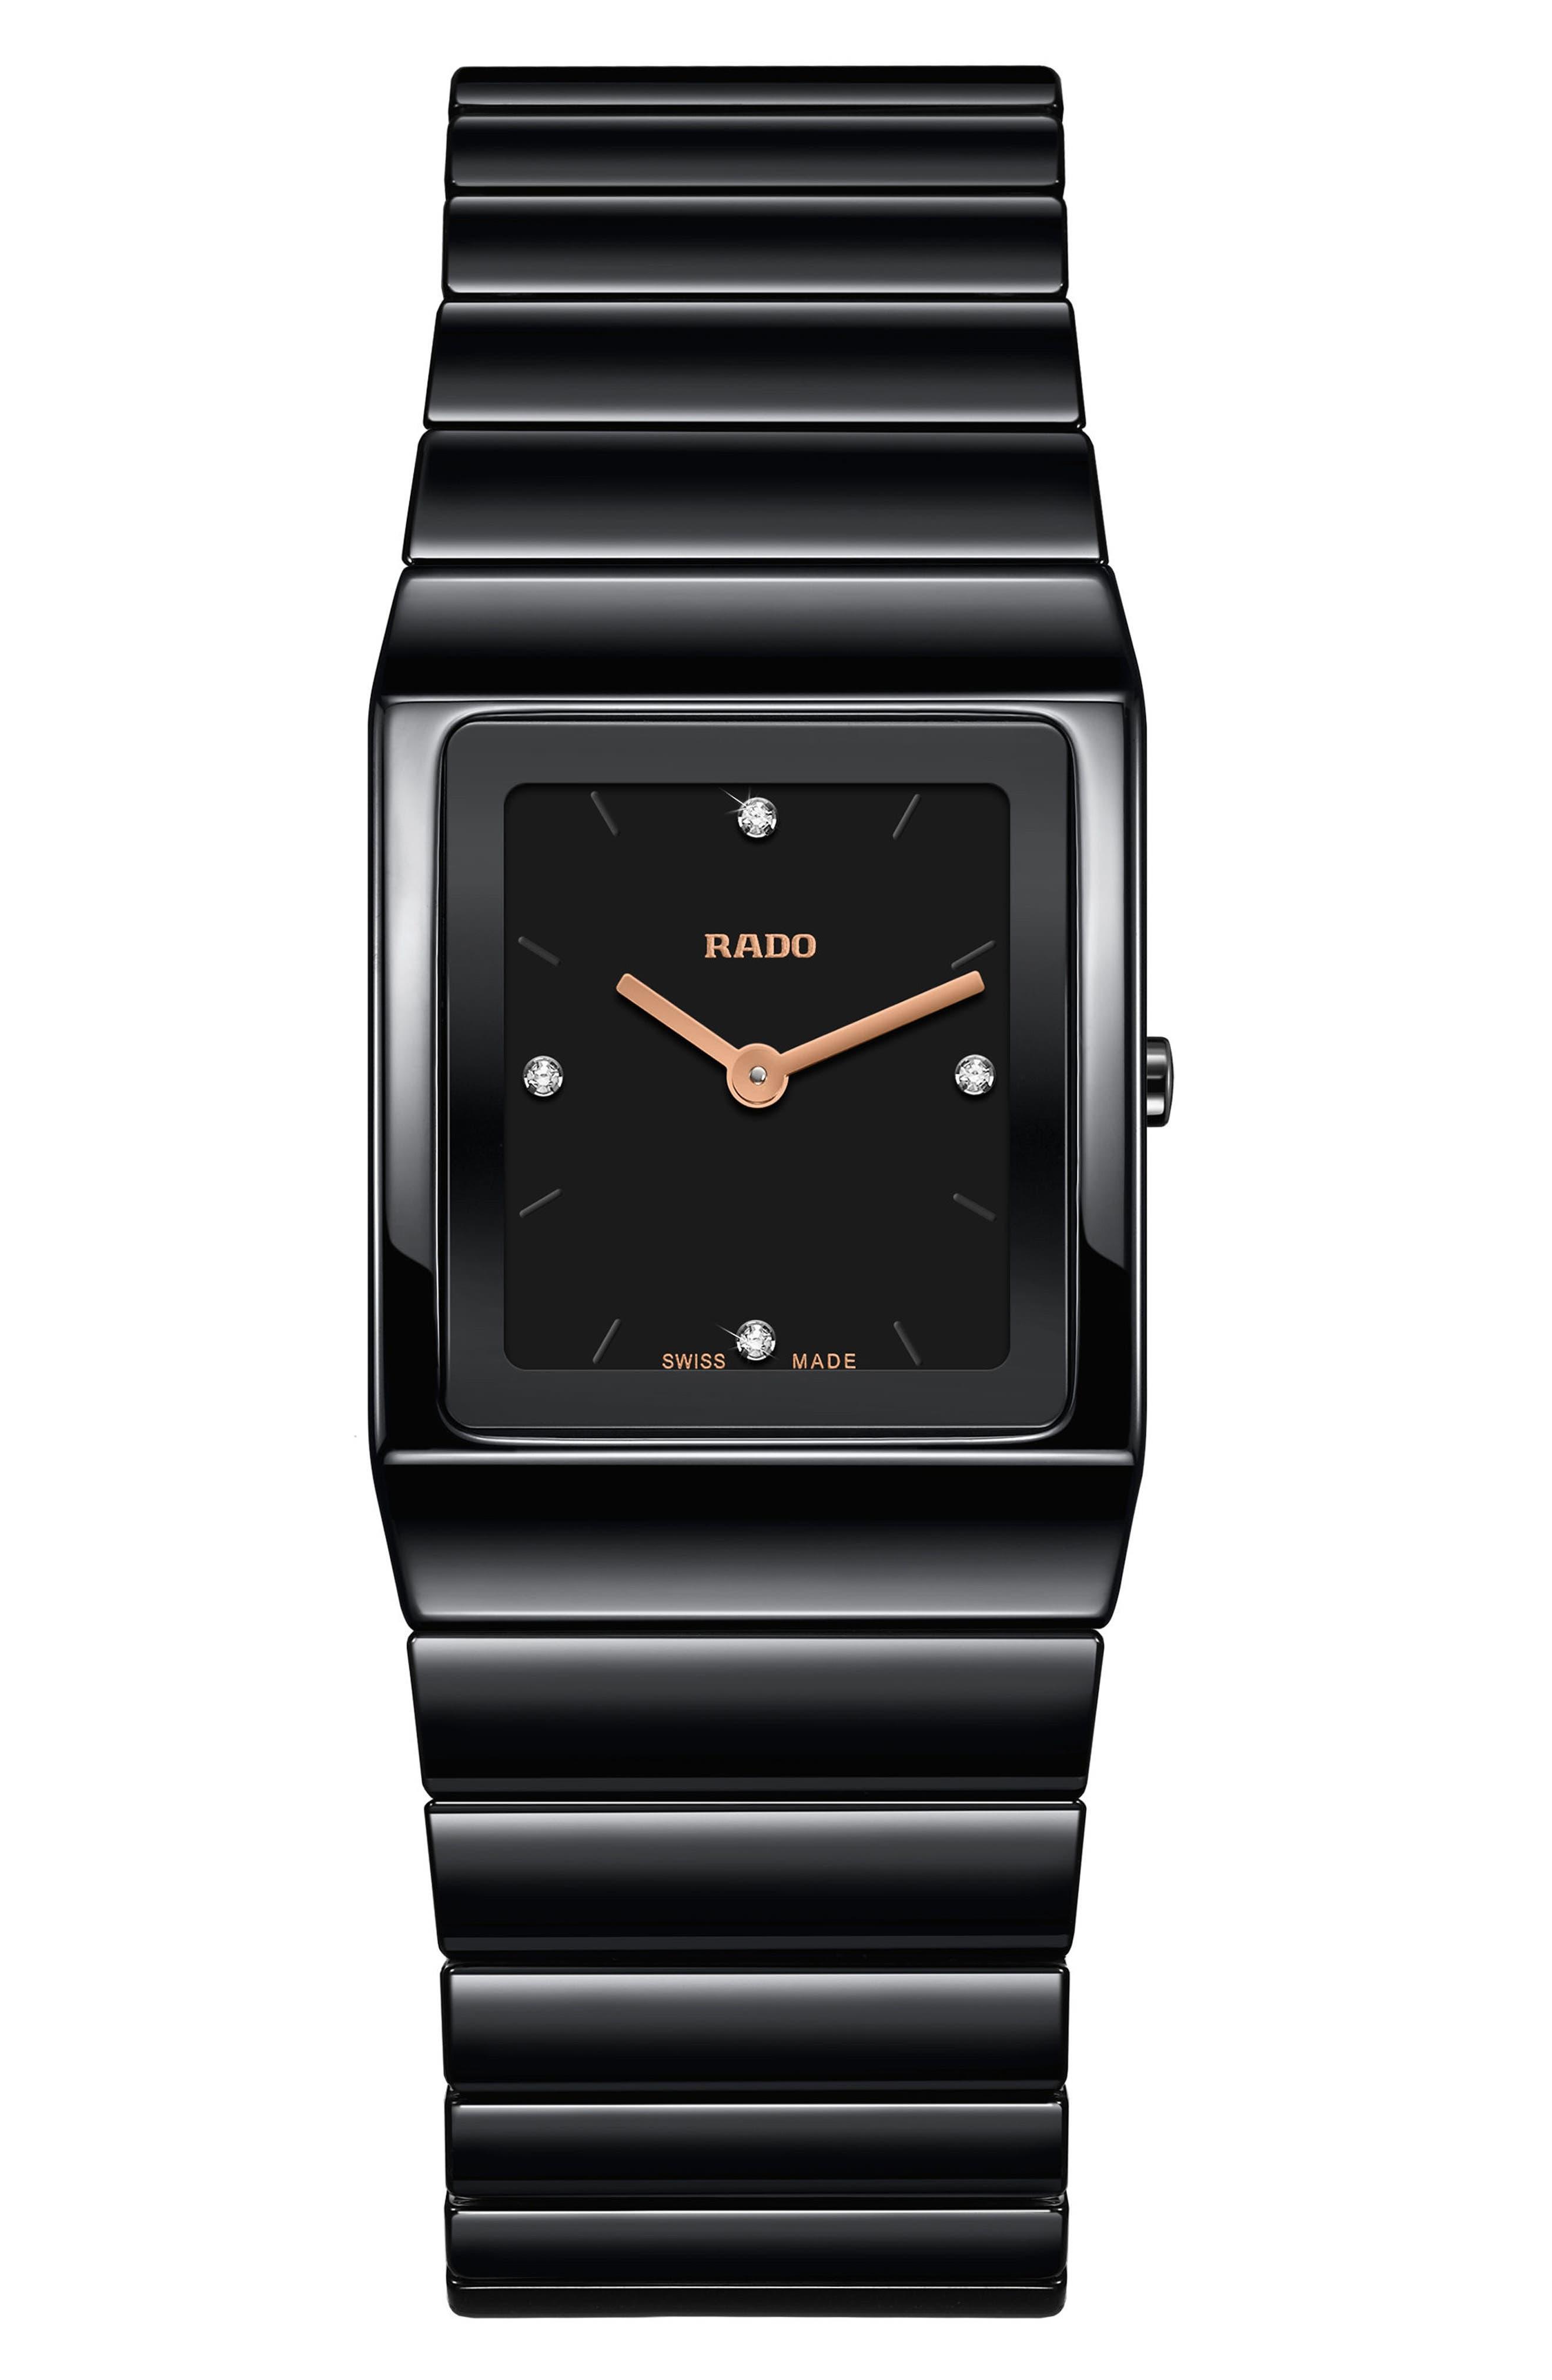 Main Image - RADO Ceramica Diamond Bracelet Watch, 22.9mm x 31.7mm